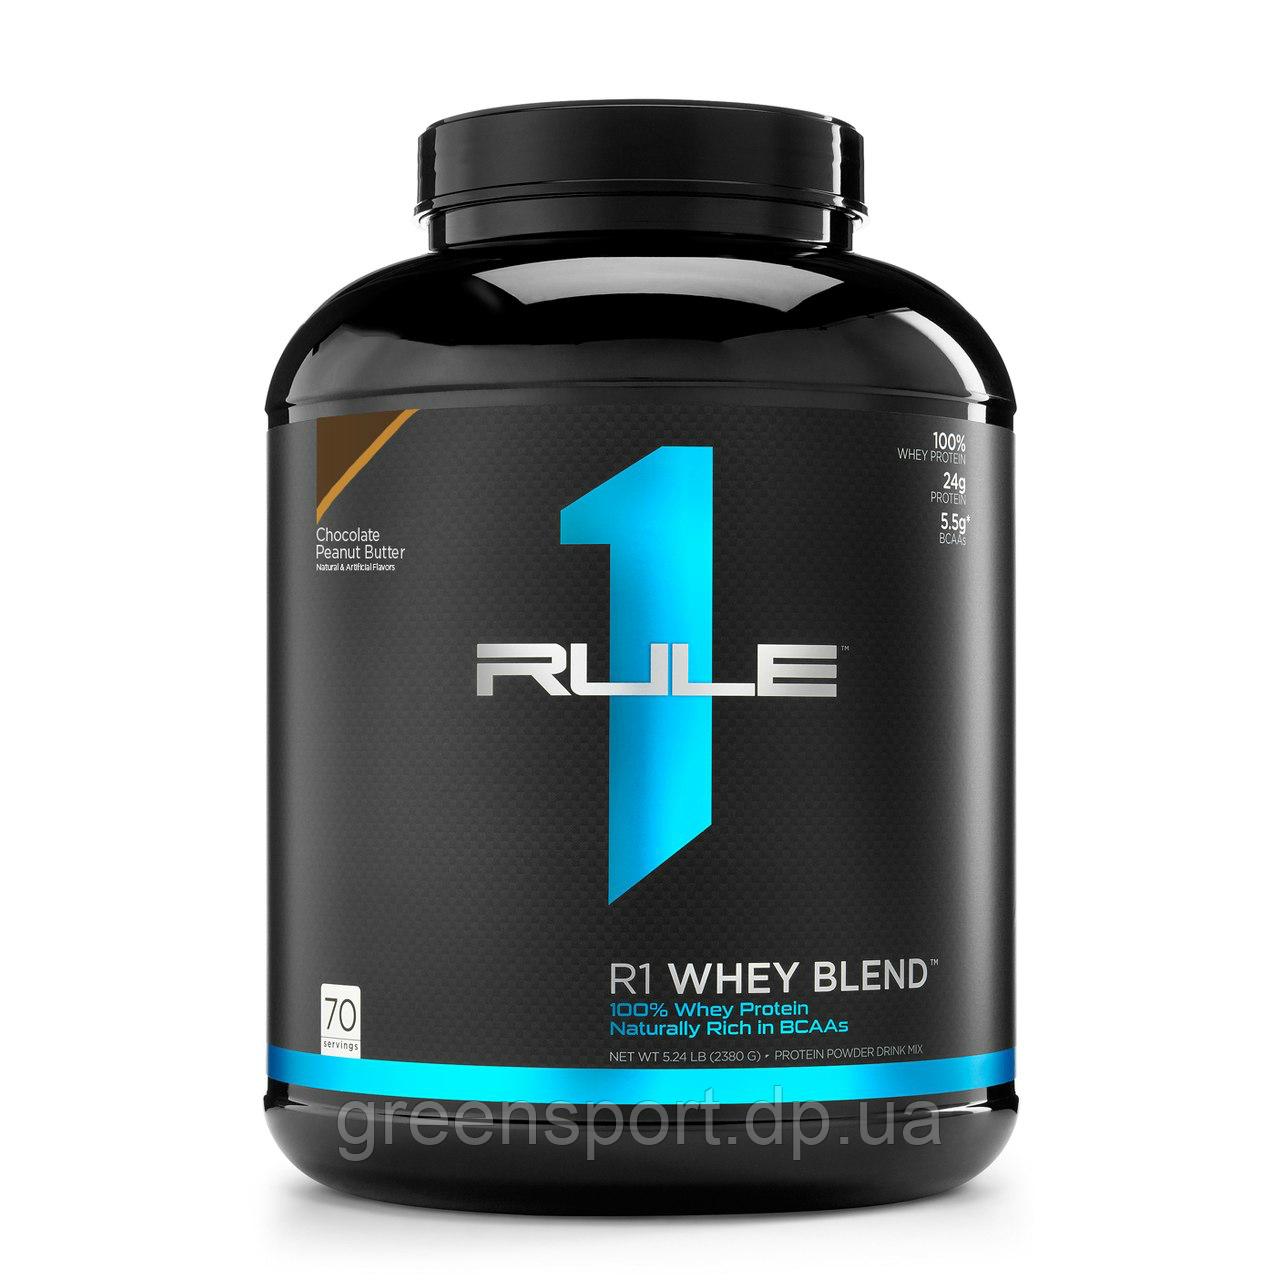 Протеин Rule One Proteins R1 Whey Blend (2,38 кг) Шоколадно-арахисовые сливки